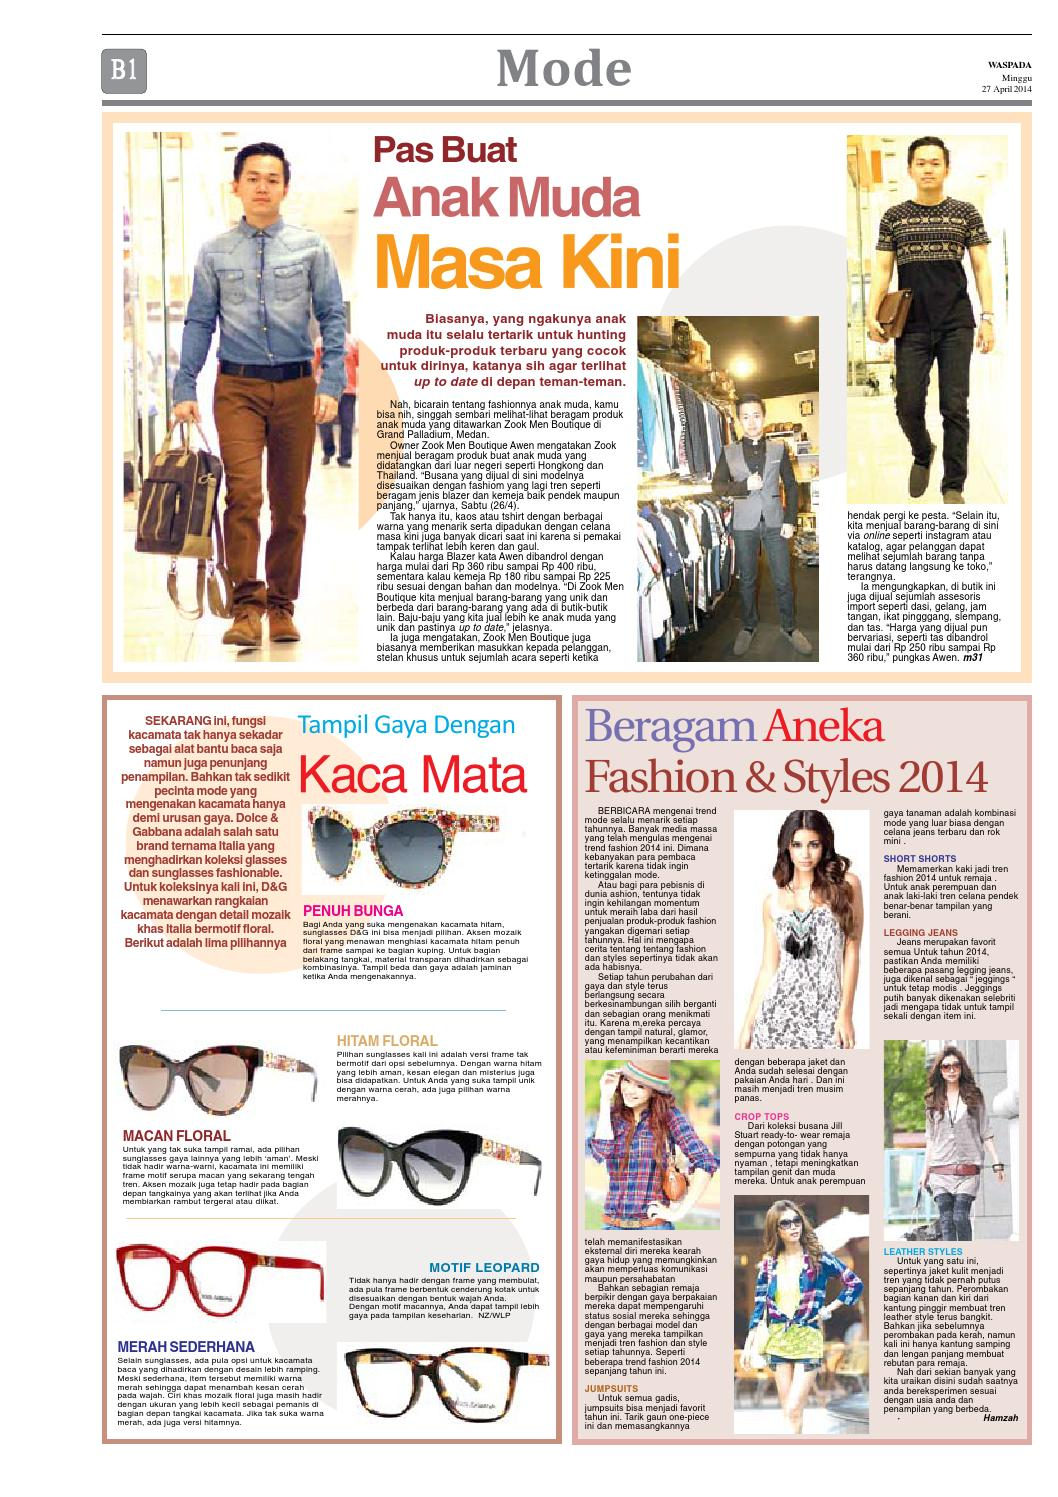 Waspada Minggu 27 April 2014 By Harian Issuu Katalog Aneka Fashion Anak